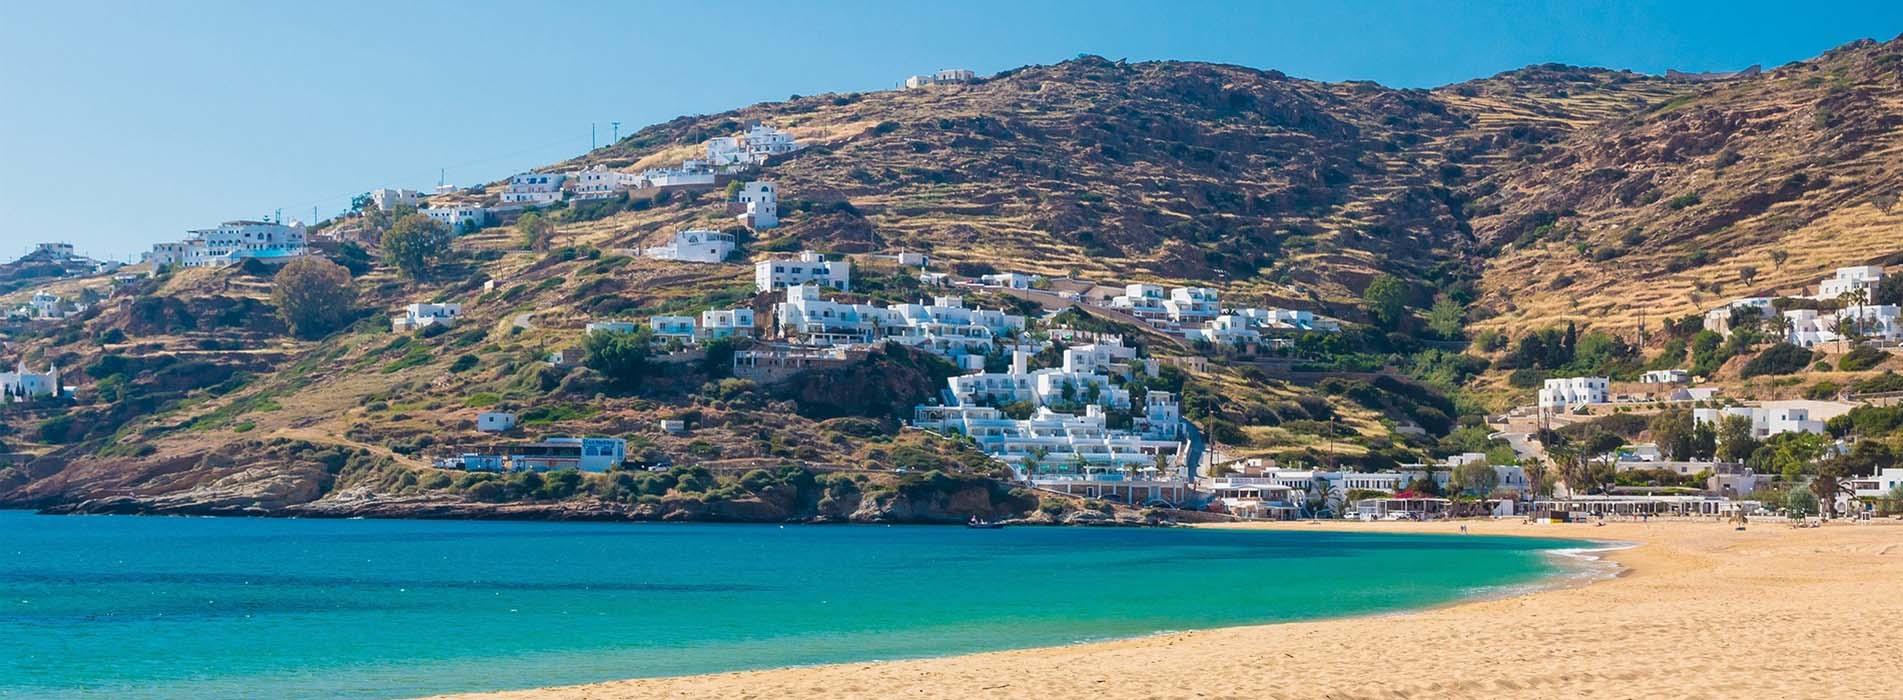 Greece - Ios 2 (main)